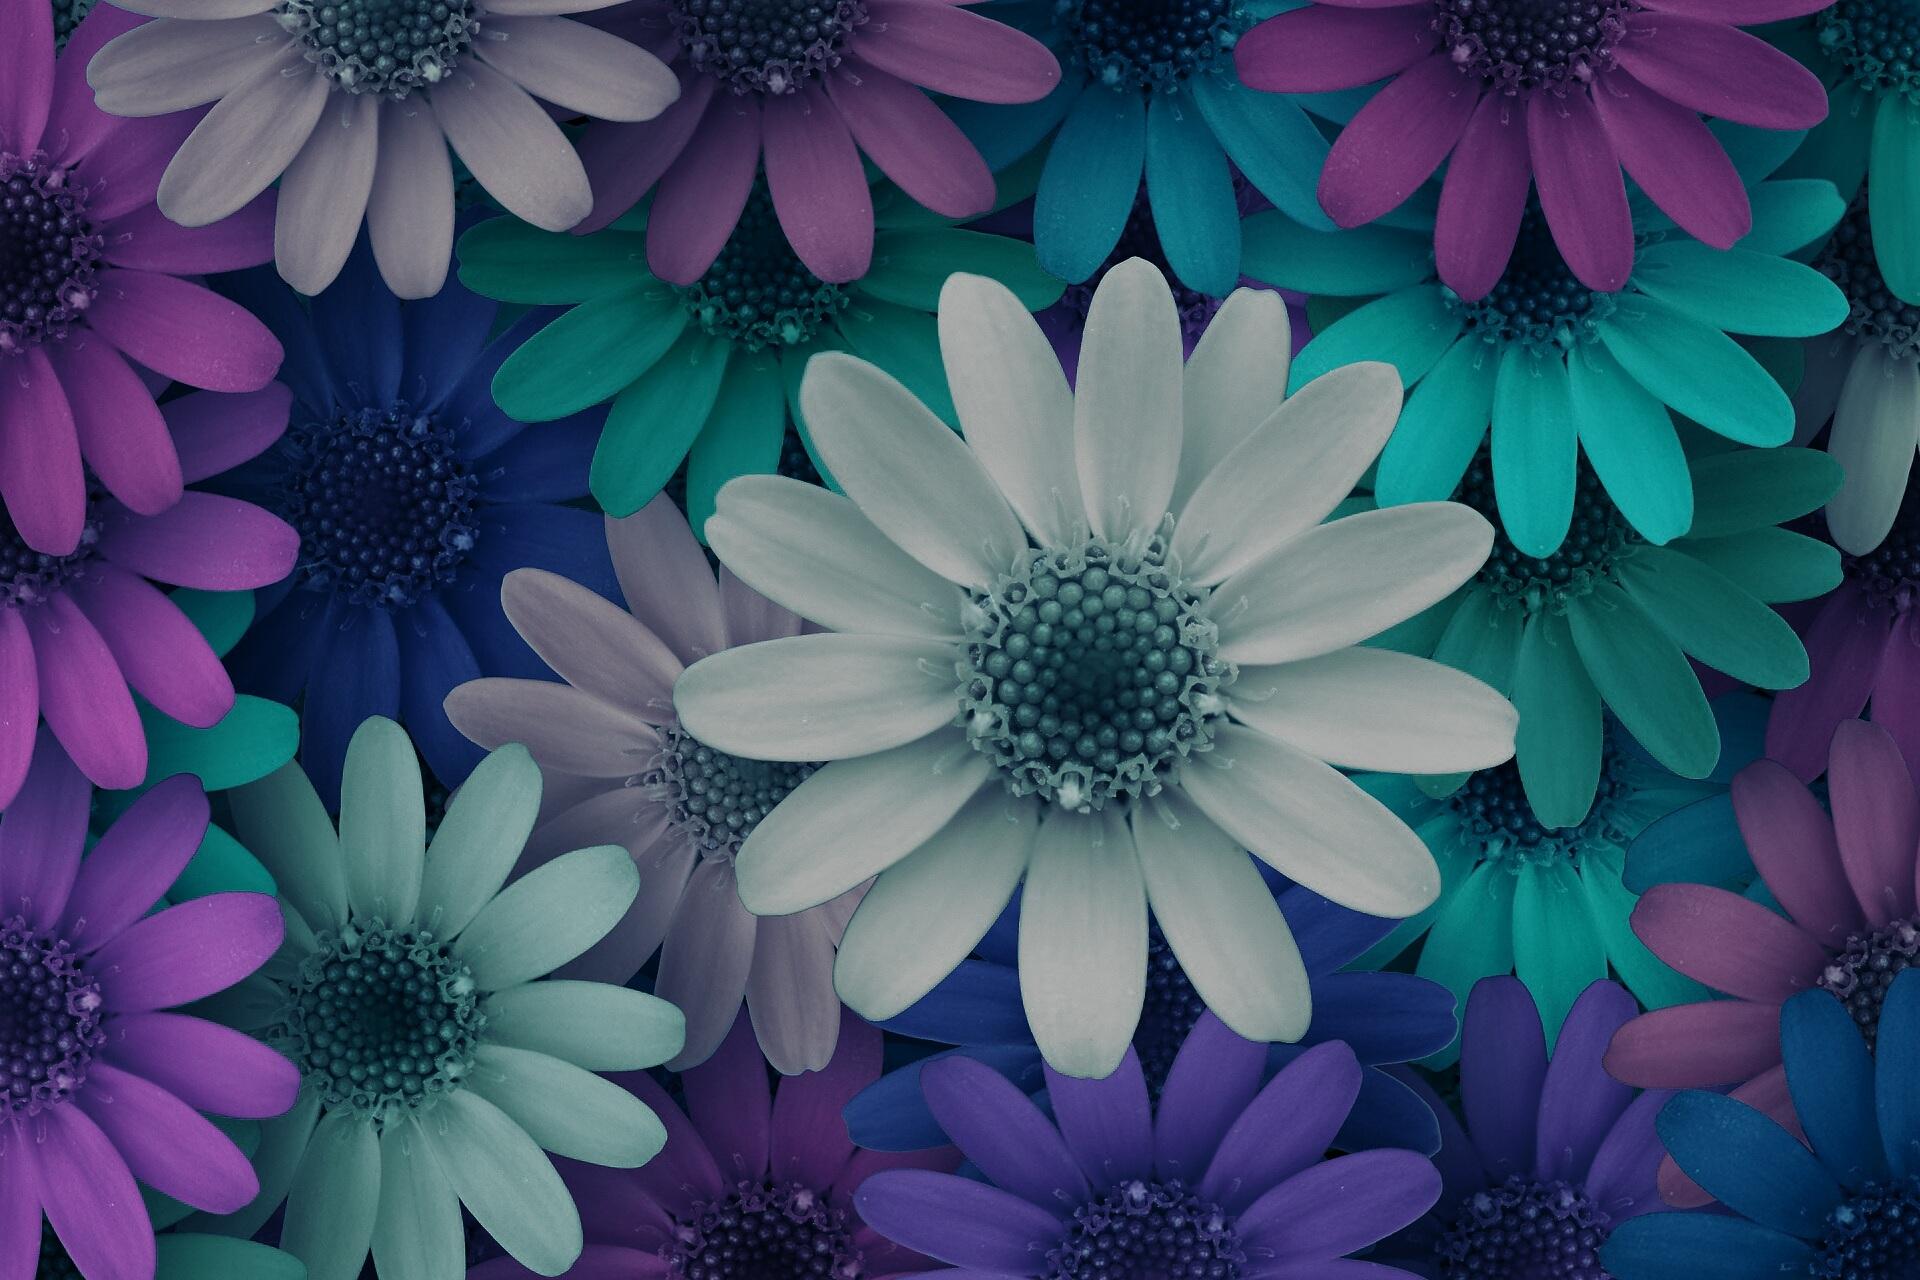 Gambar Mekar Menanam Ungu Daun Bunga Berkembang Pola Hijau